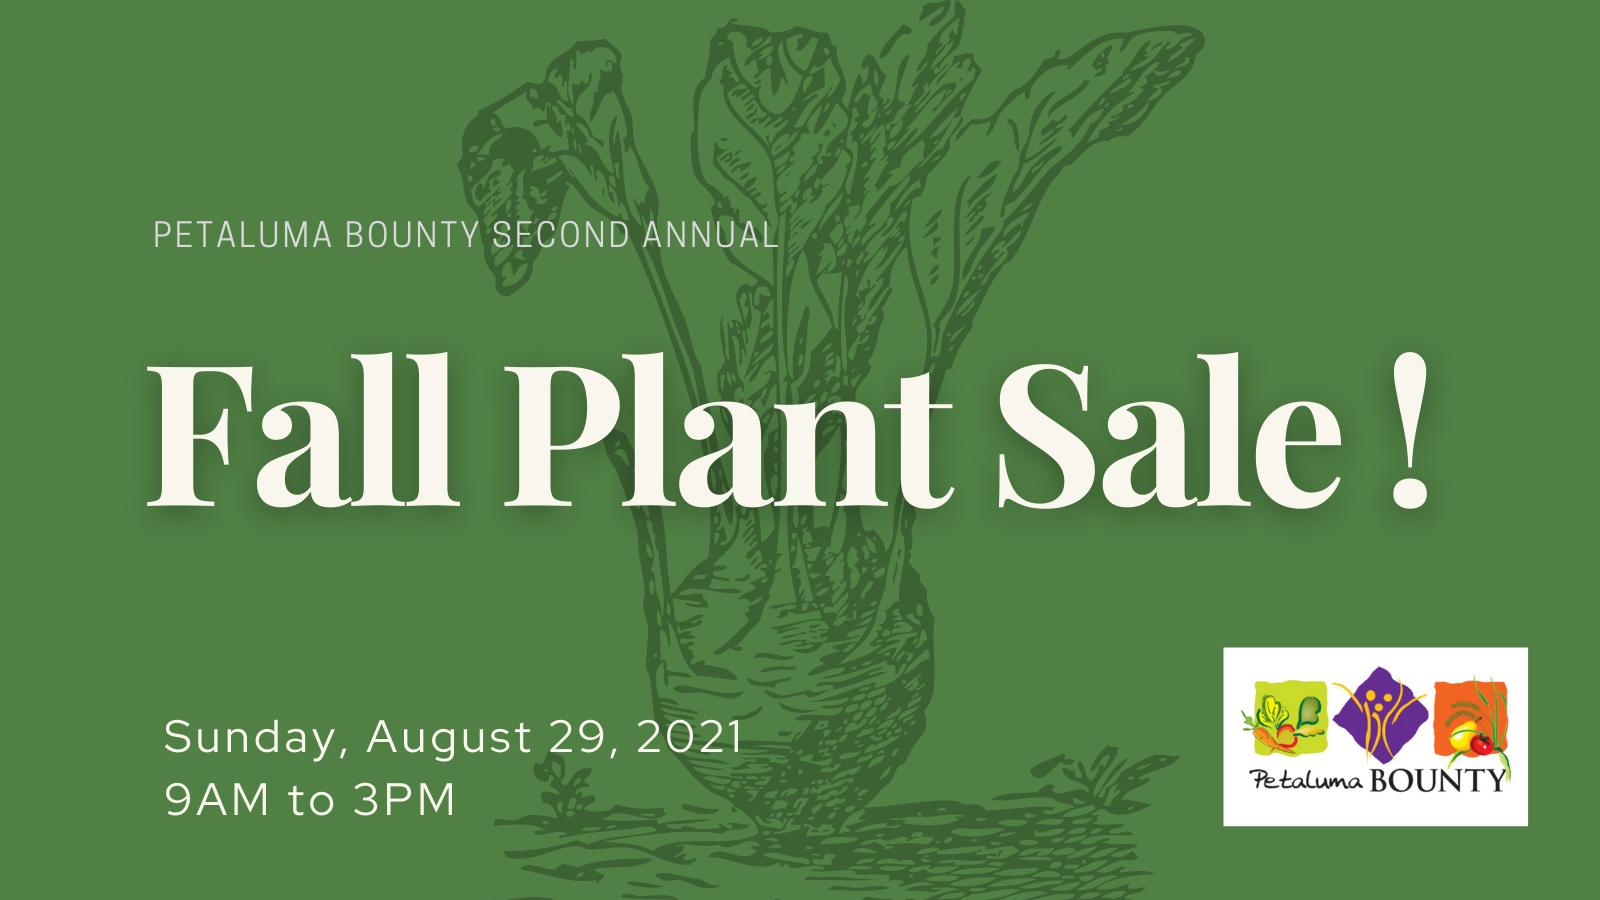 Petaluma Bounty Farm's 2021 Fall Plant Sale is scheduled for August 29.